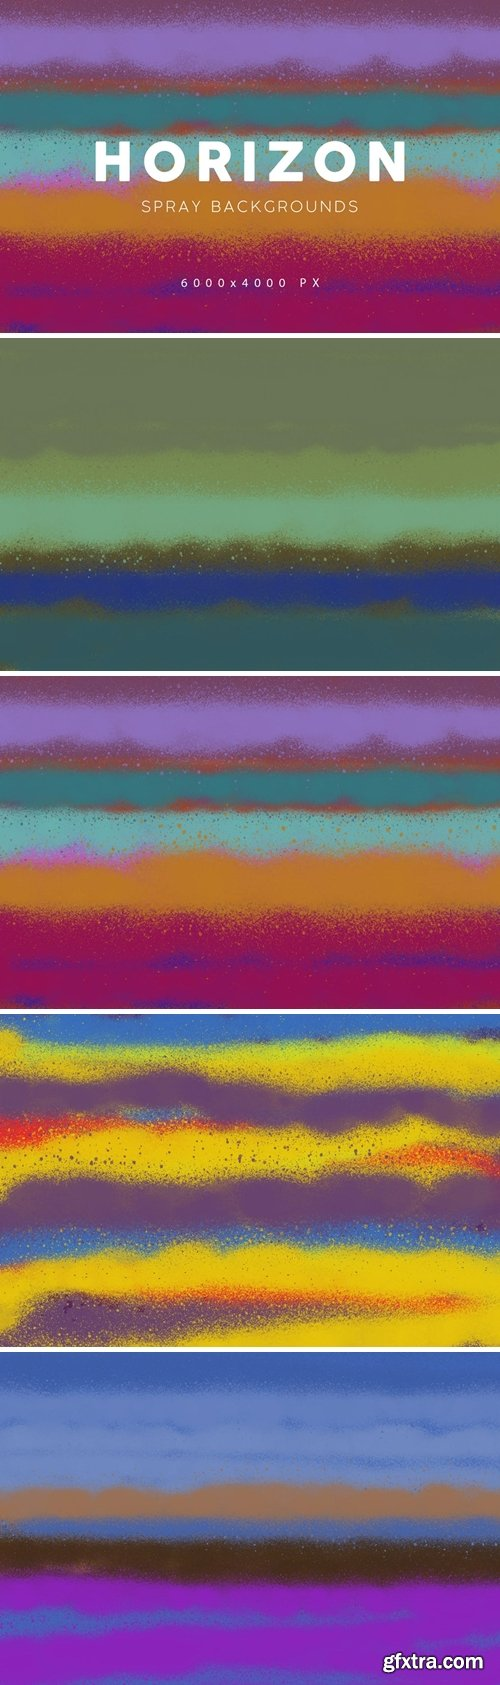 Horizon Spray Paint Backgrounds